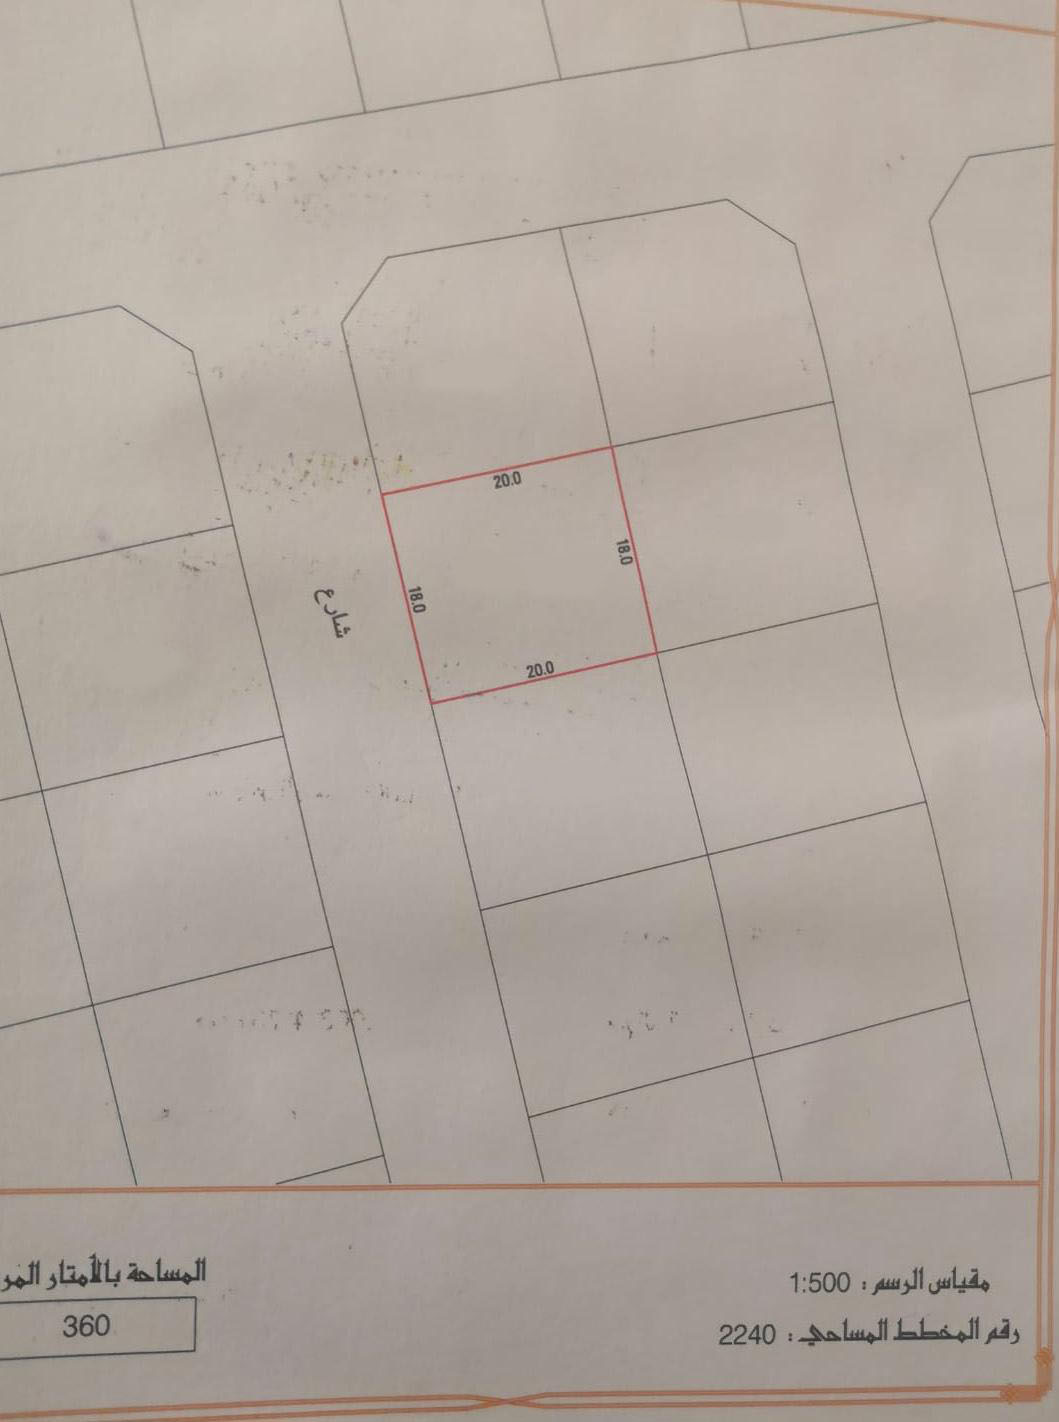 For Sale Land in Malkiya Ref: MAL-SB-004